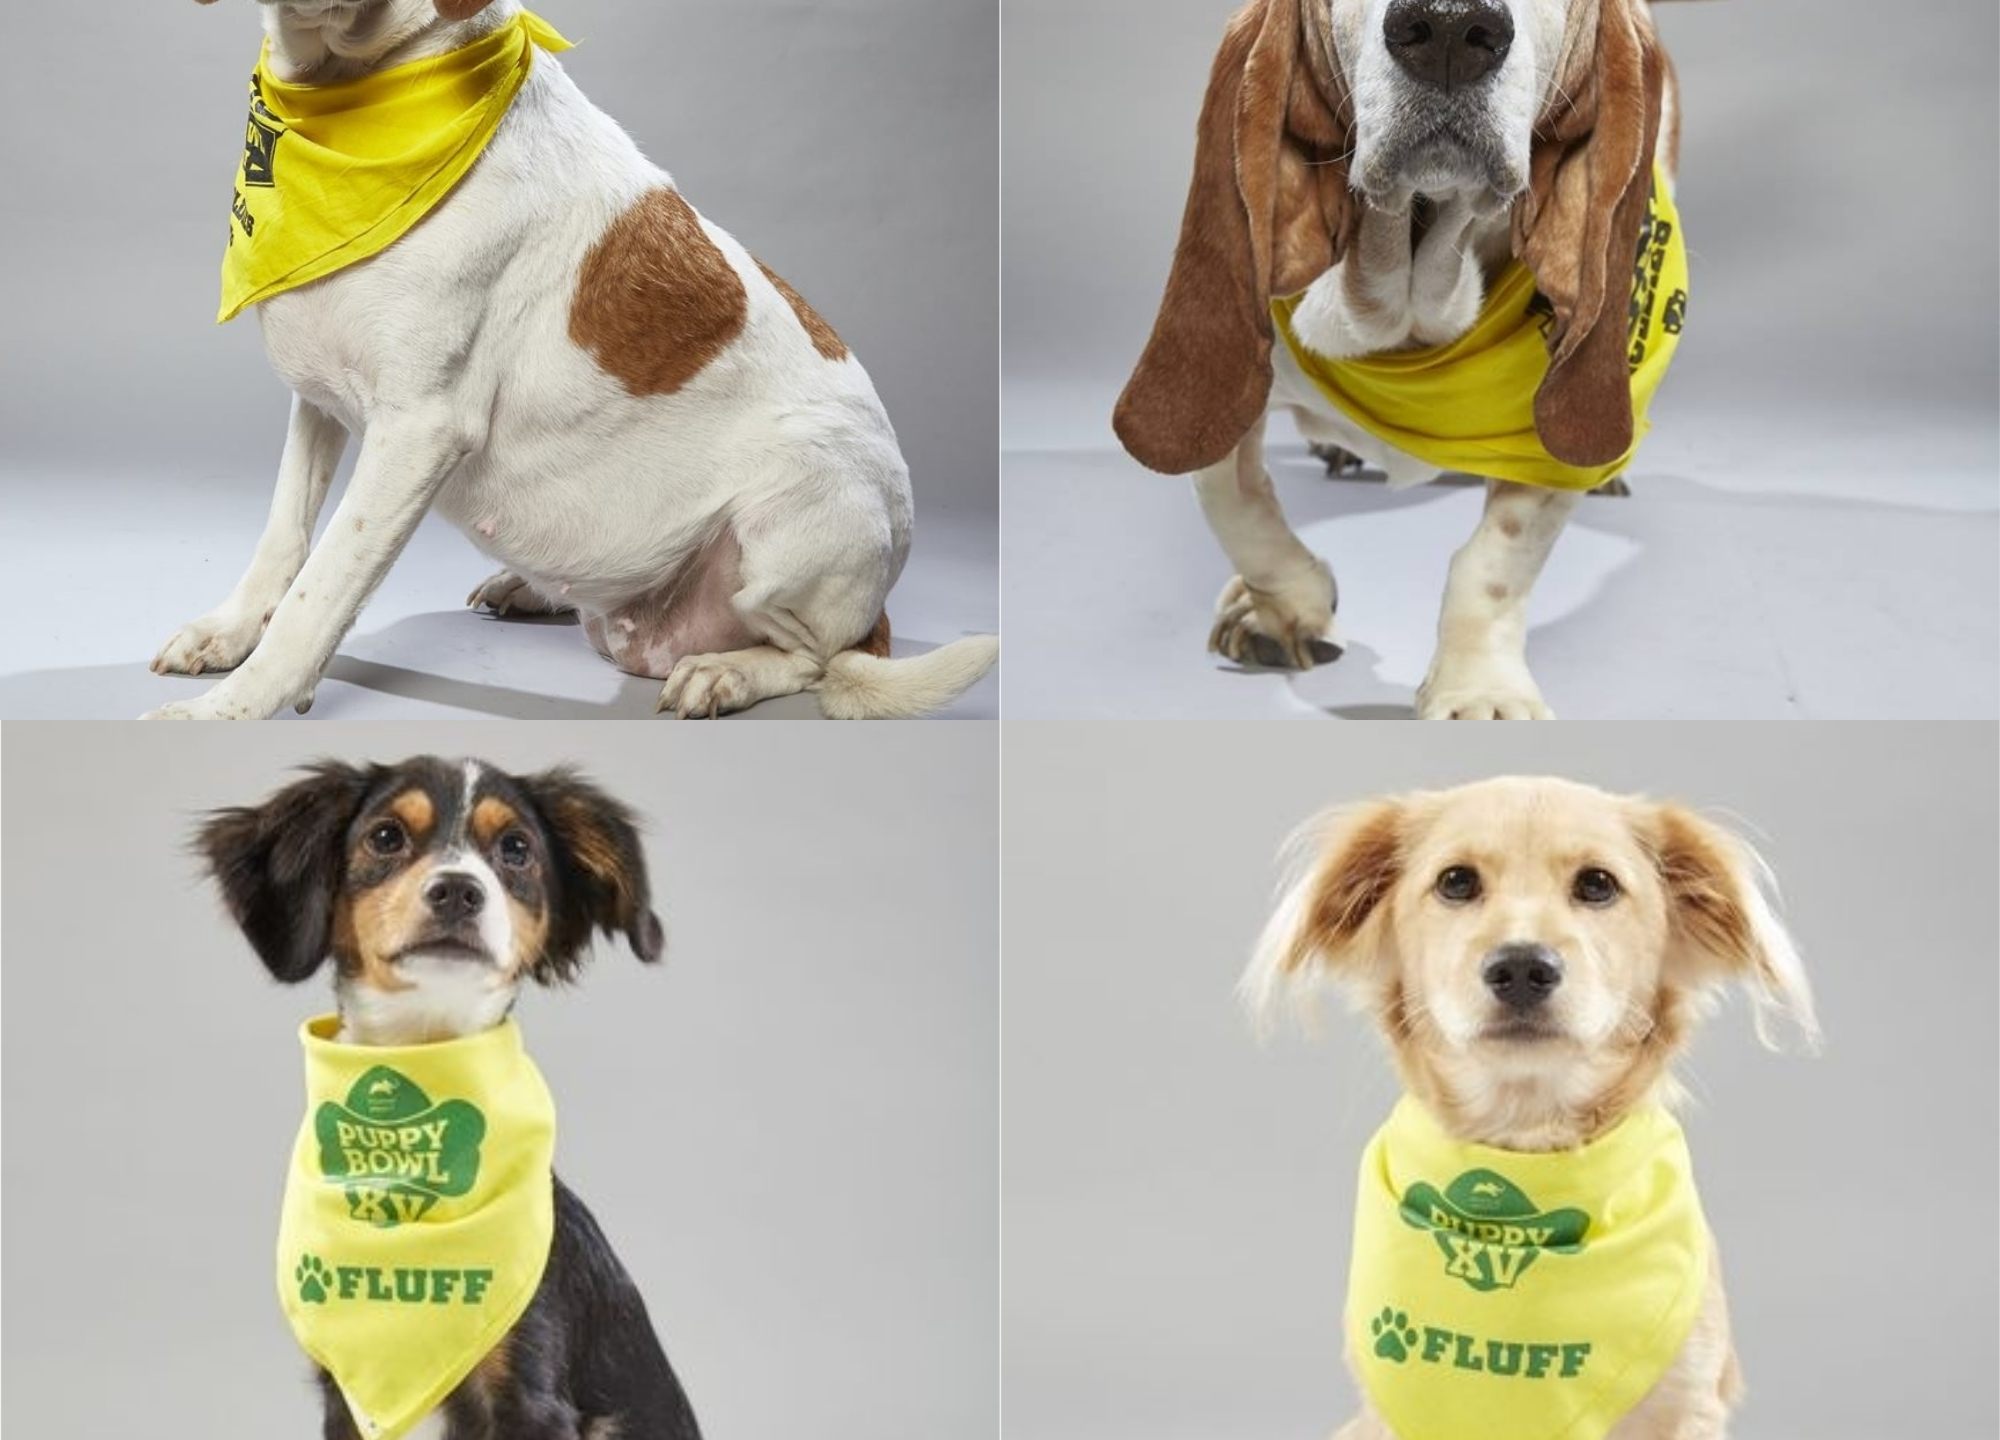 Norf SPCA VBSPCA Dog Puppy Bowl 2019_1548958914801.jpg.jpg